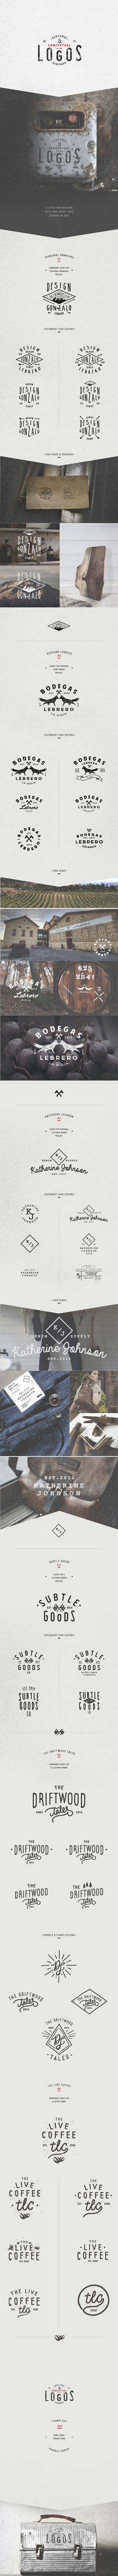 Logos 2013 by Gonzalo Lebrero, via Behance